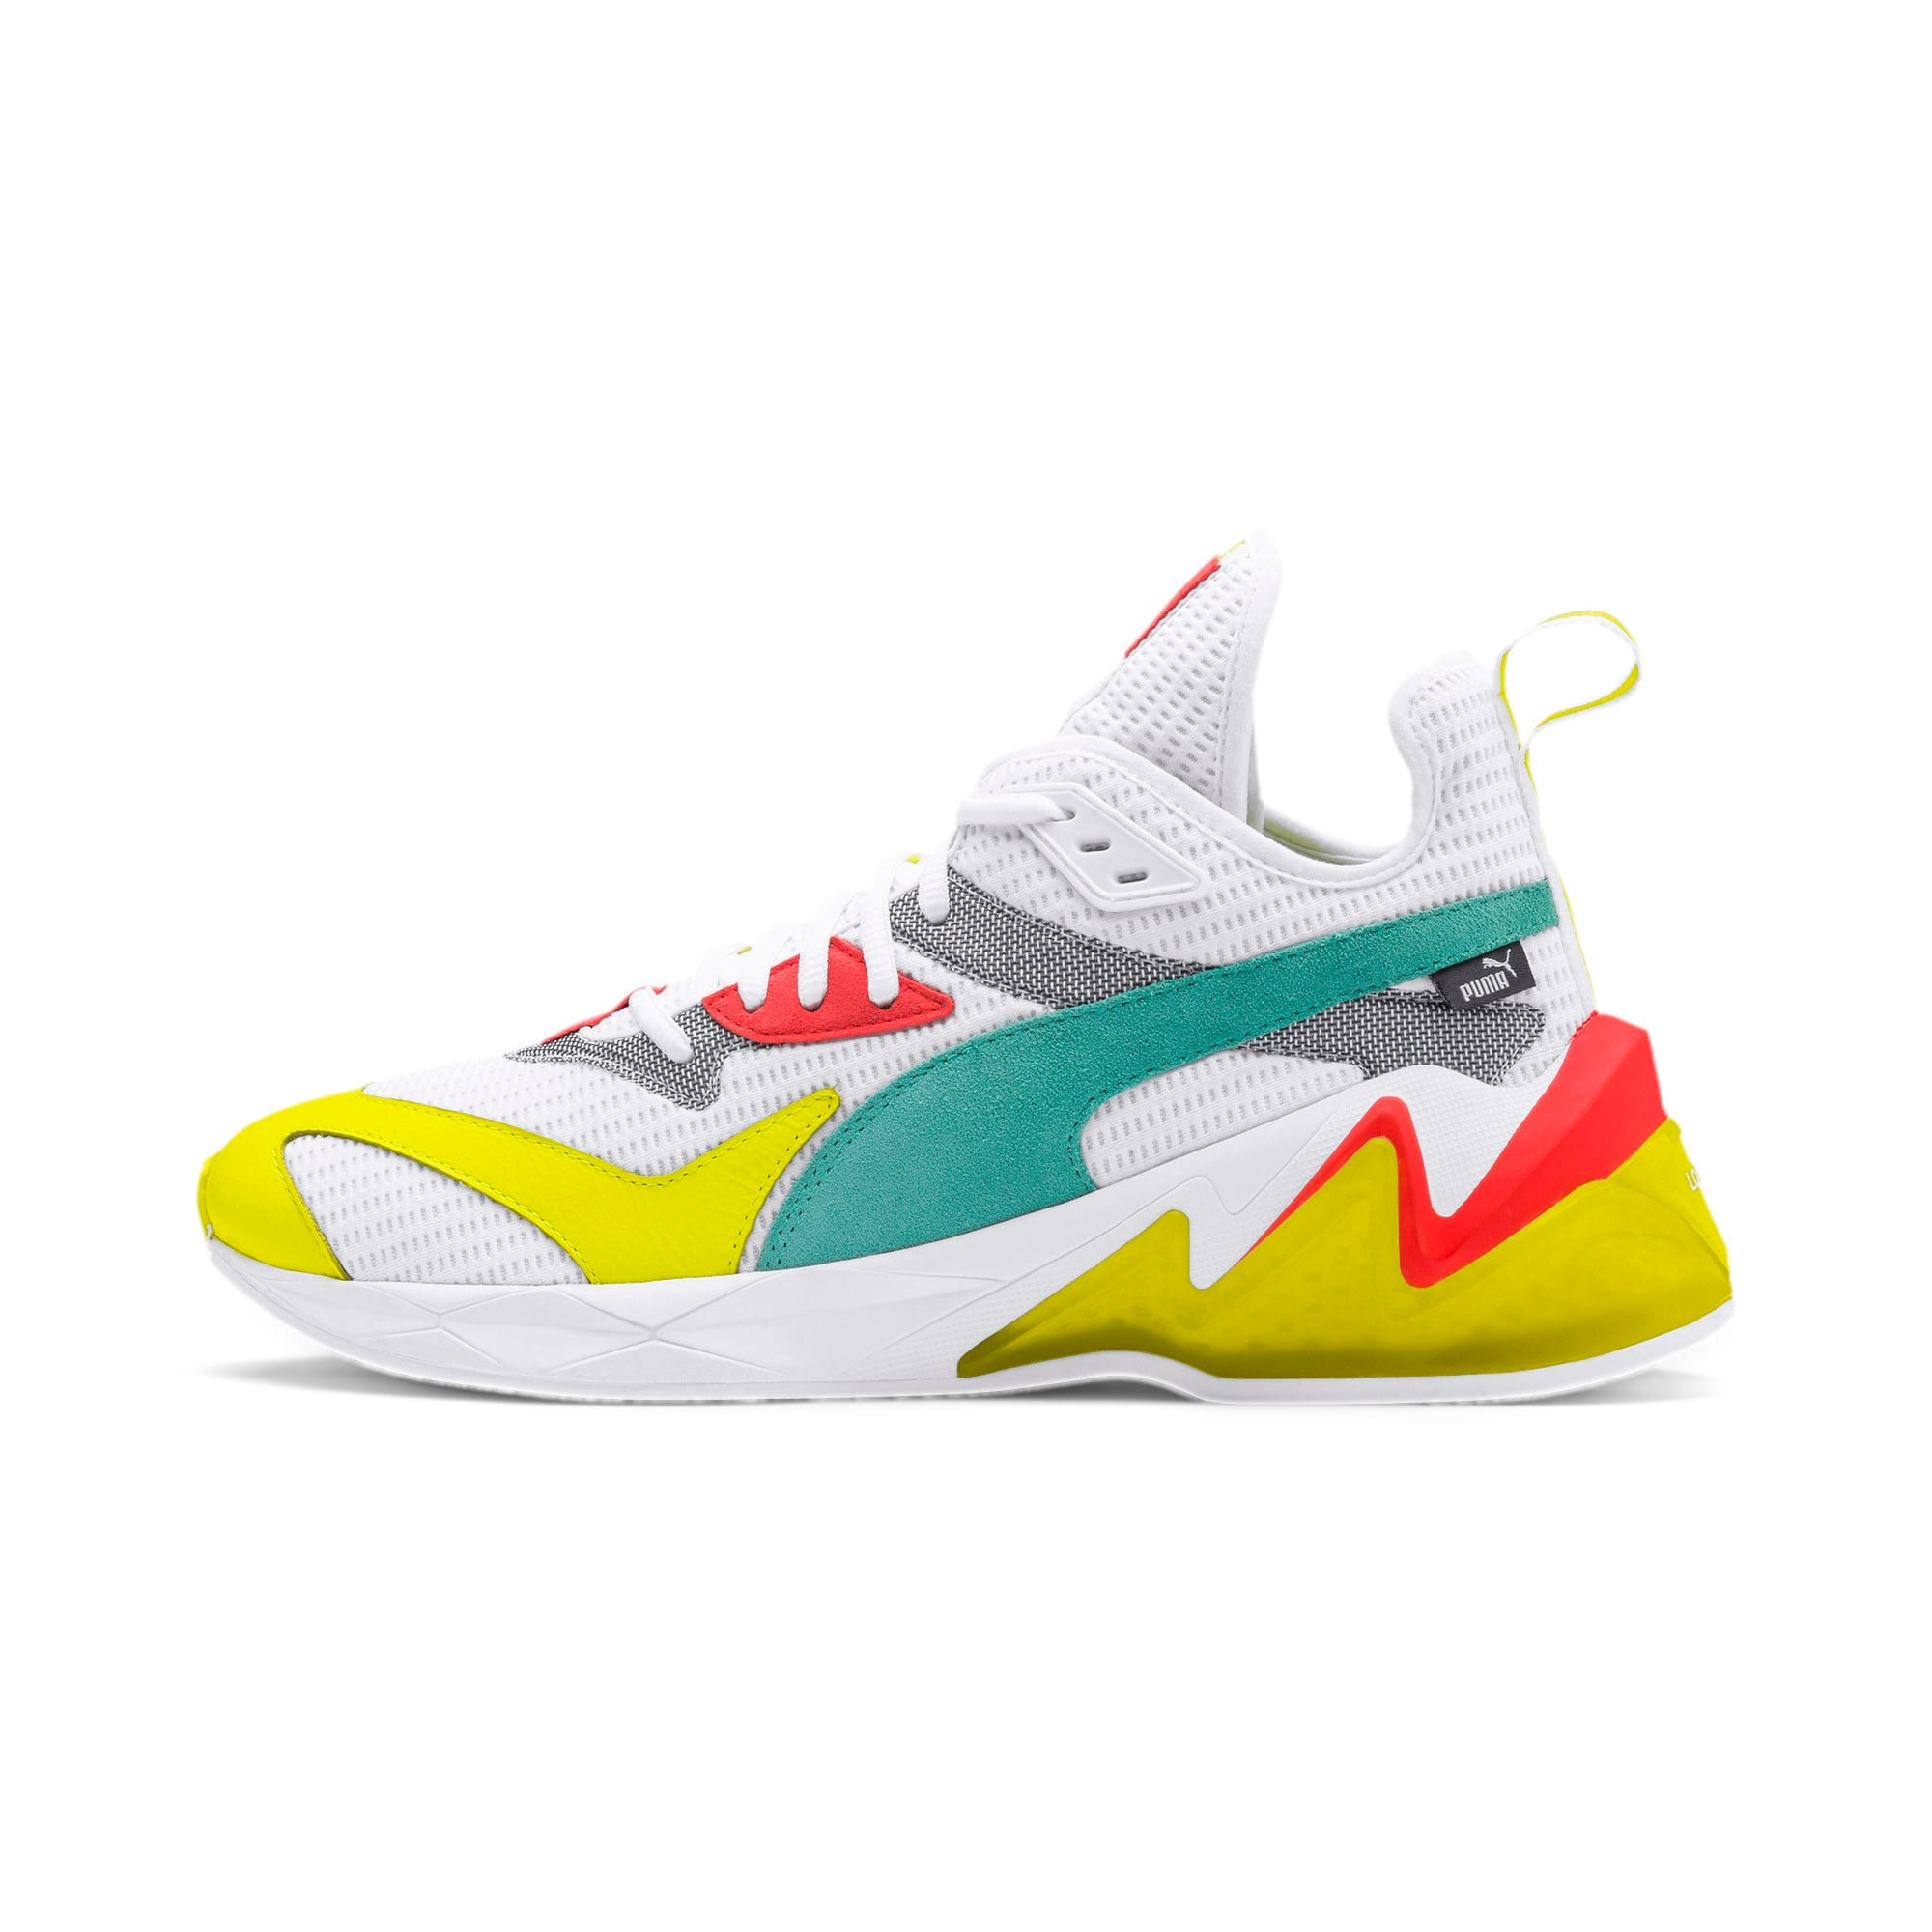 Miniatura 1 de Zapatos de entrenamientoLQDCELL Origin para hombre, Puma White-Yellow Alert, mediano